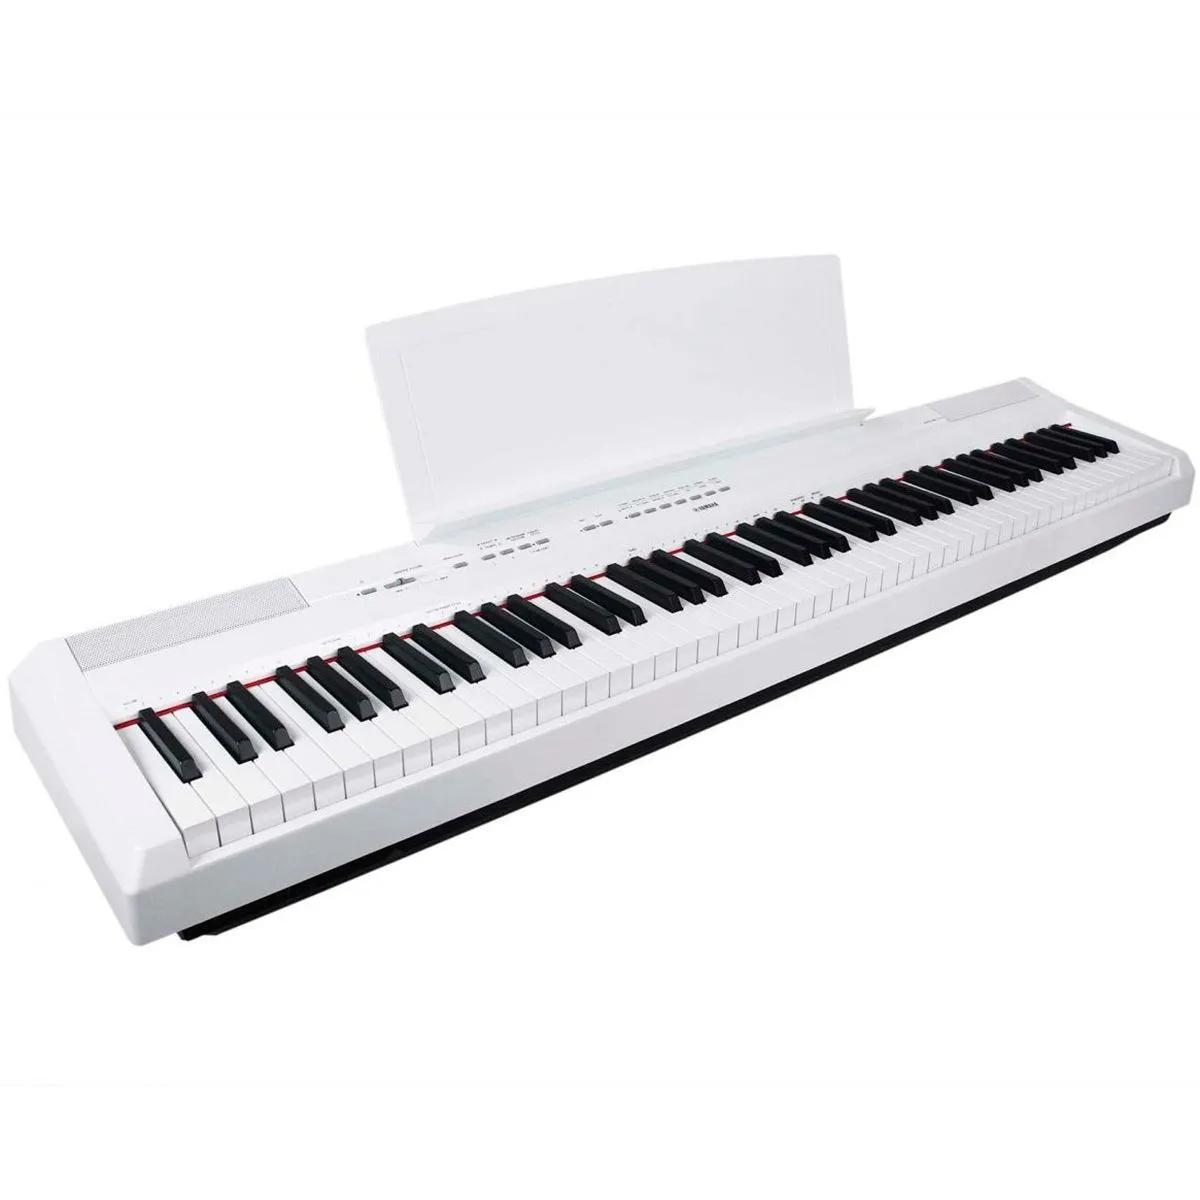 Piano Digital Yamaha P115 Graded Hammer Standard White 88 Teclas